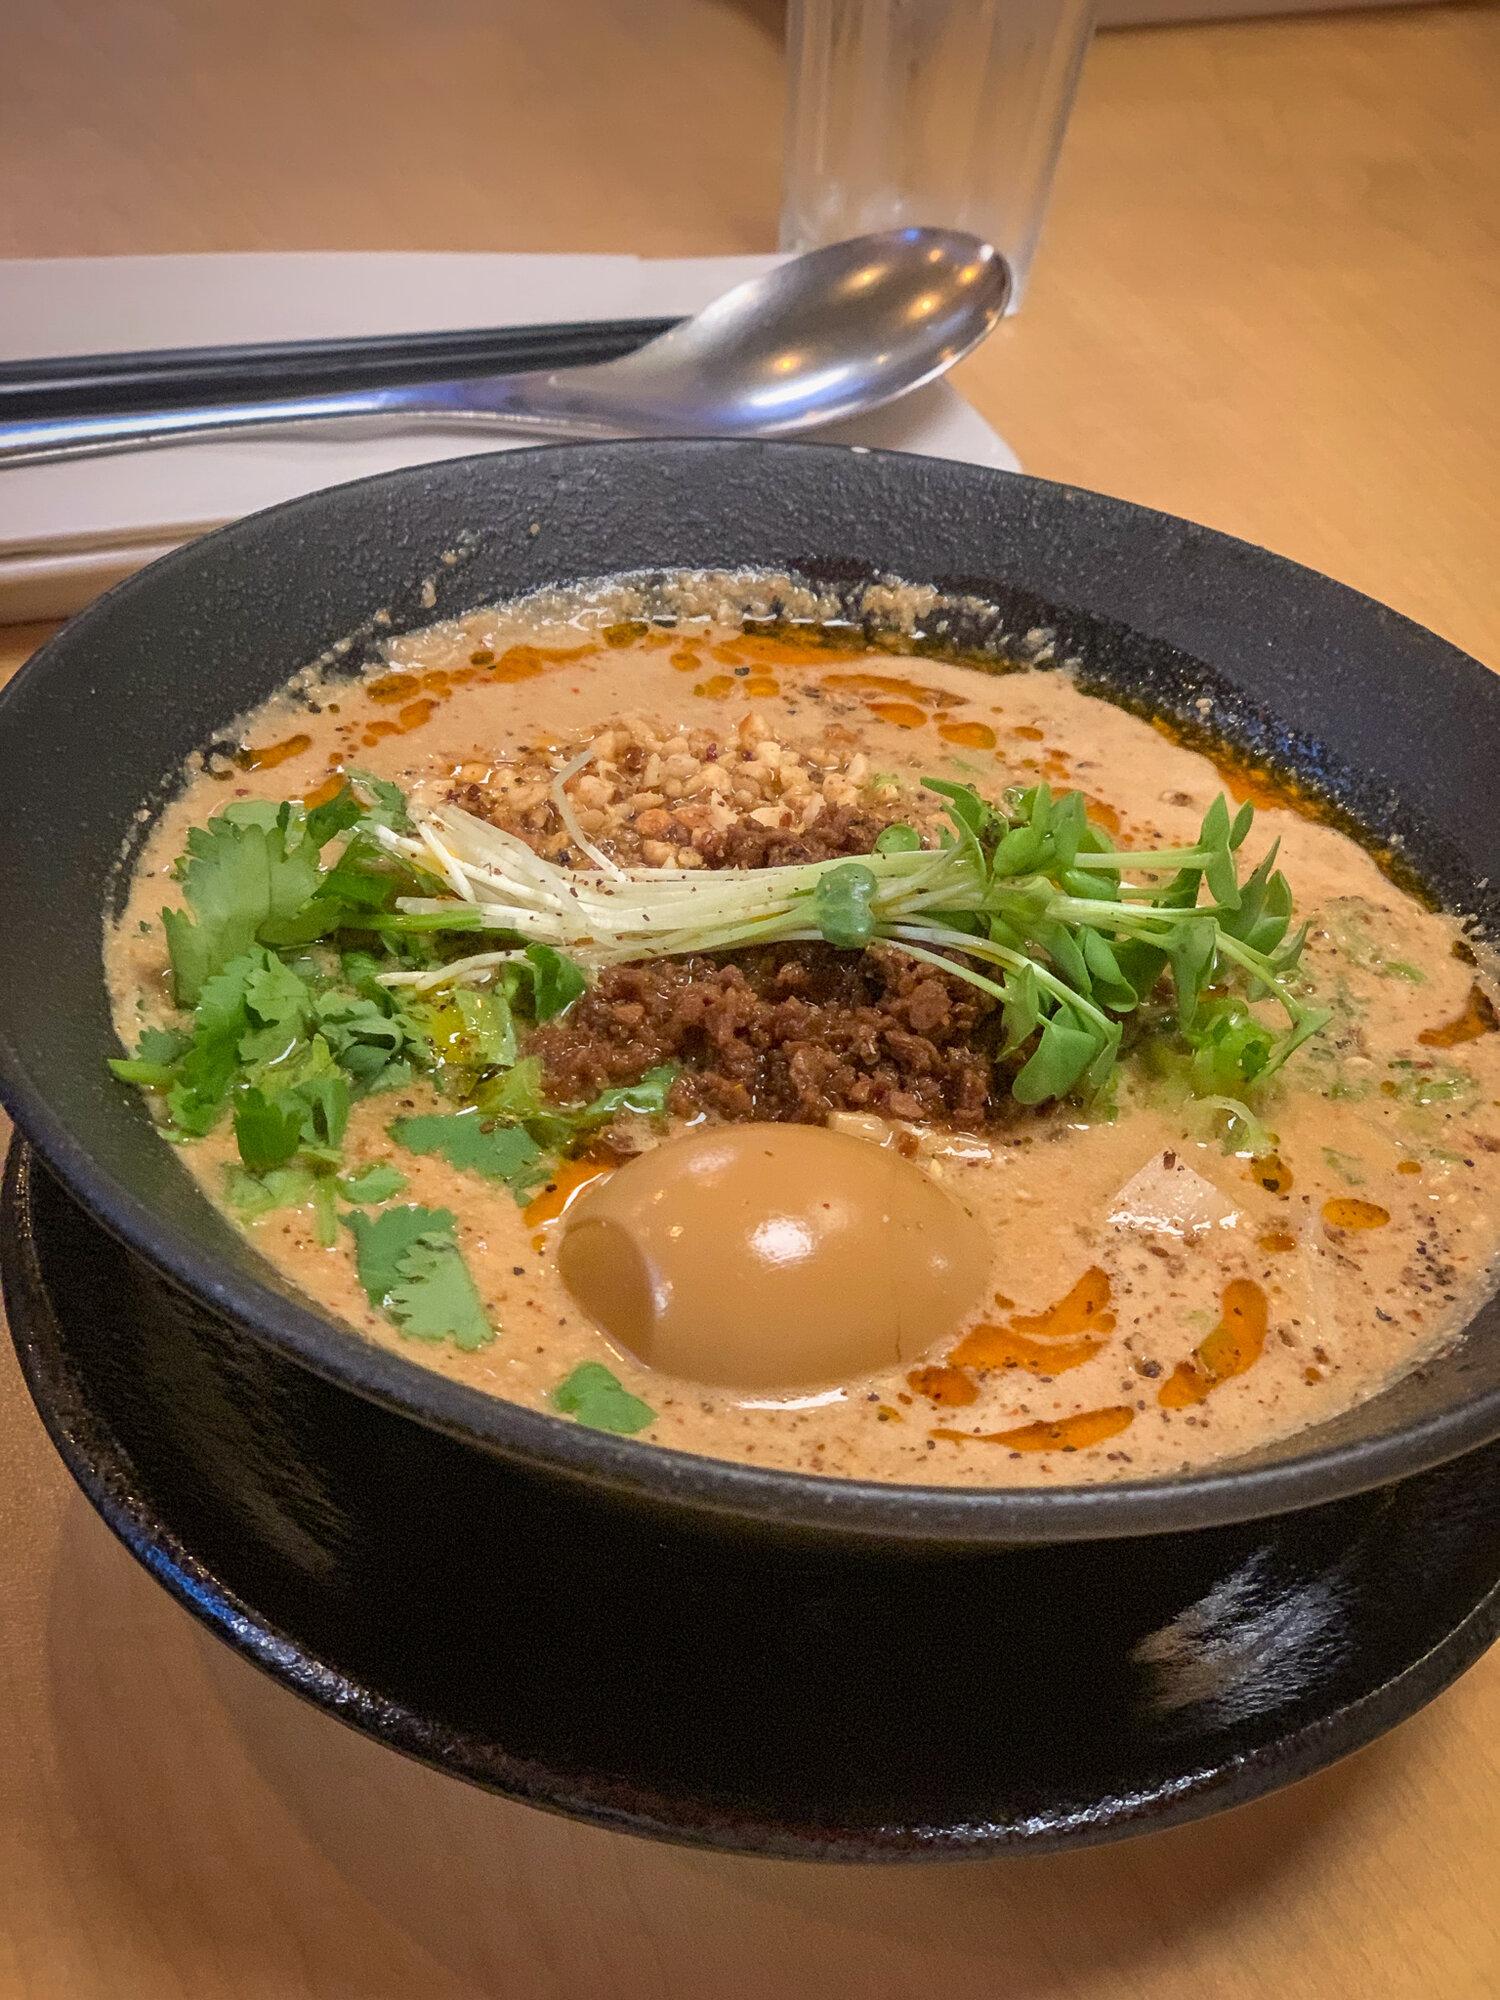 Vegan Tantanmen: Vegetable Soup w/ Konbu and Mushrooms, Premium Japanese Soy Cream, Seven Types of Nuts, Sesame, Cilantro